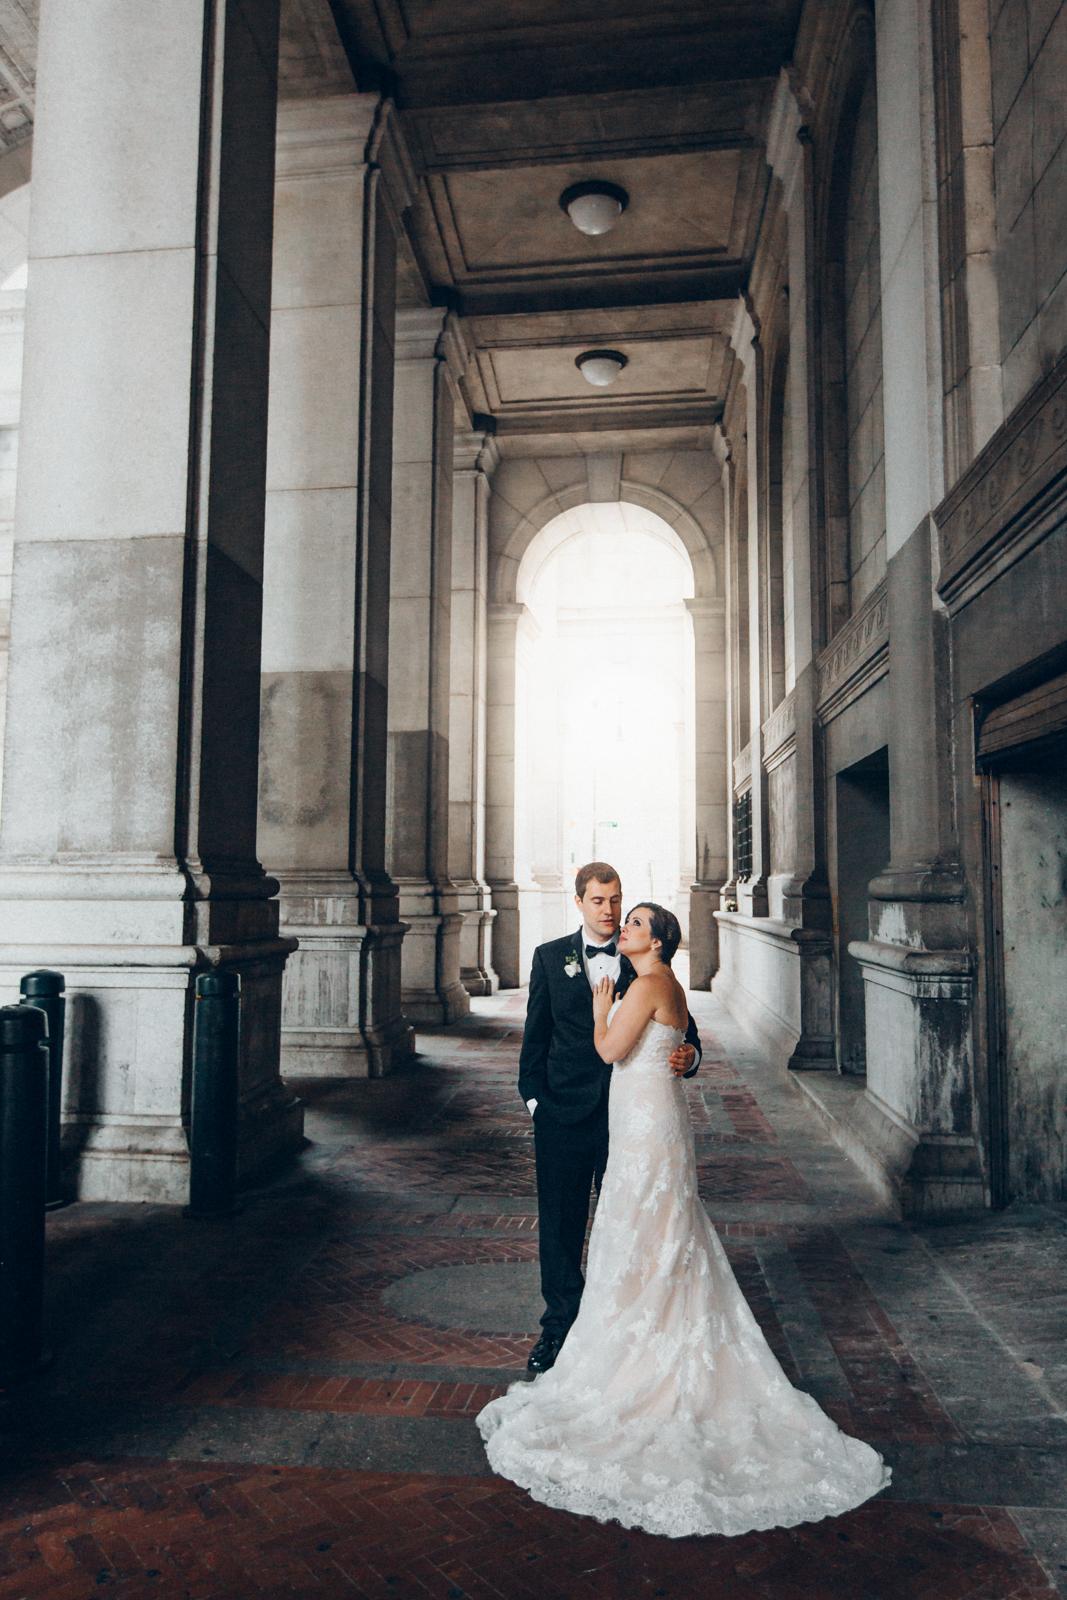 NYC Wedding Photography Lofts at Prince Brooklyn NYC Photographer Boris Zaretsky _B2C7900-Edit.jpg